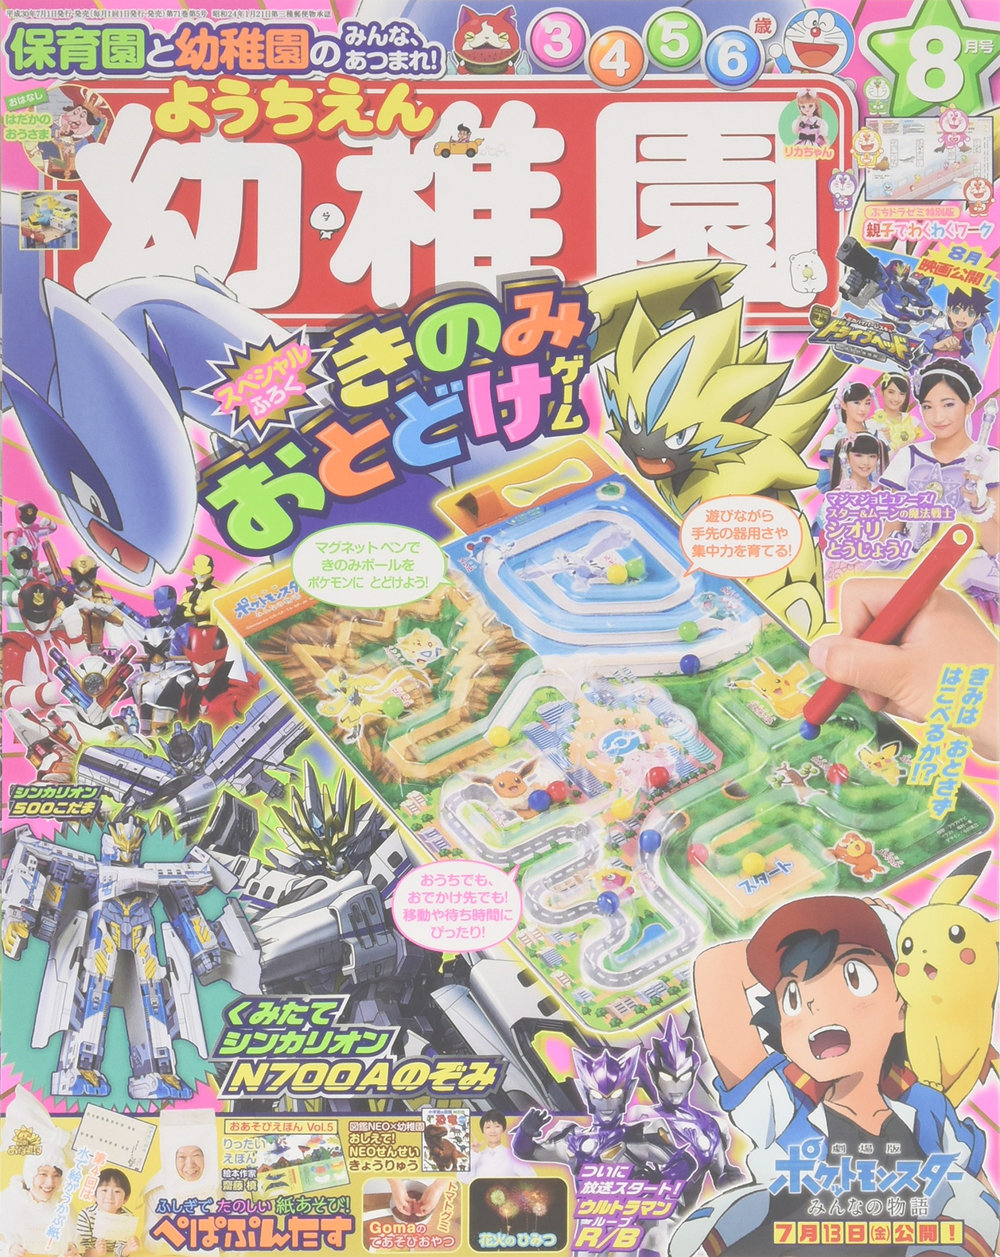 8gatsuのコピー.jpg